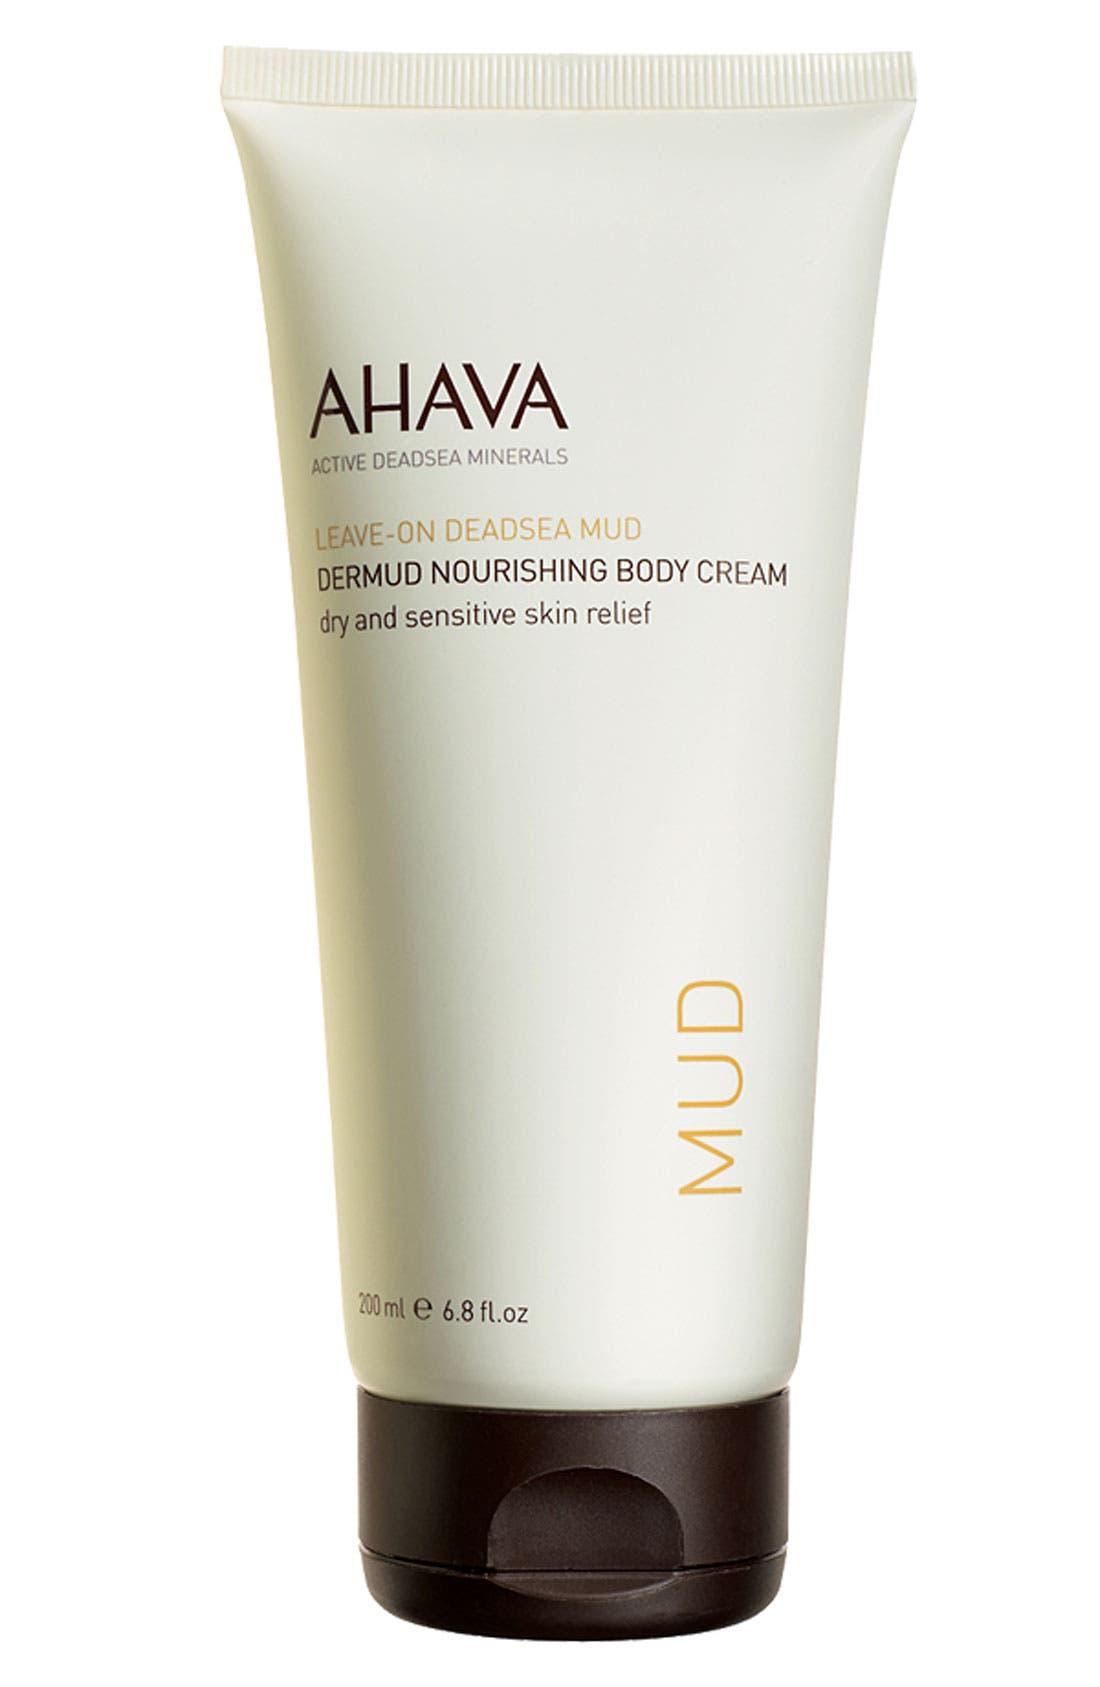 AHAVA Dermud Nourishing Body Cream